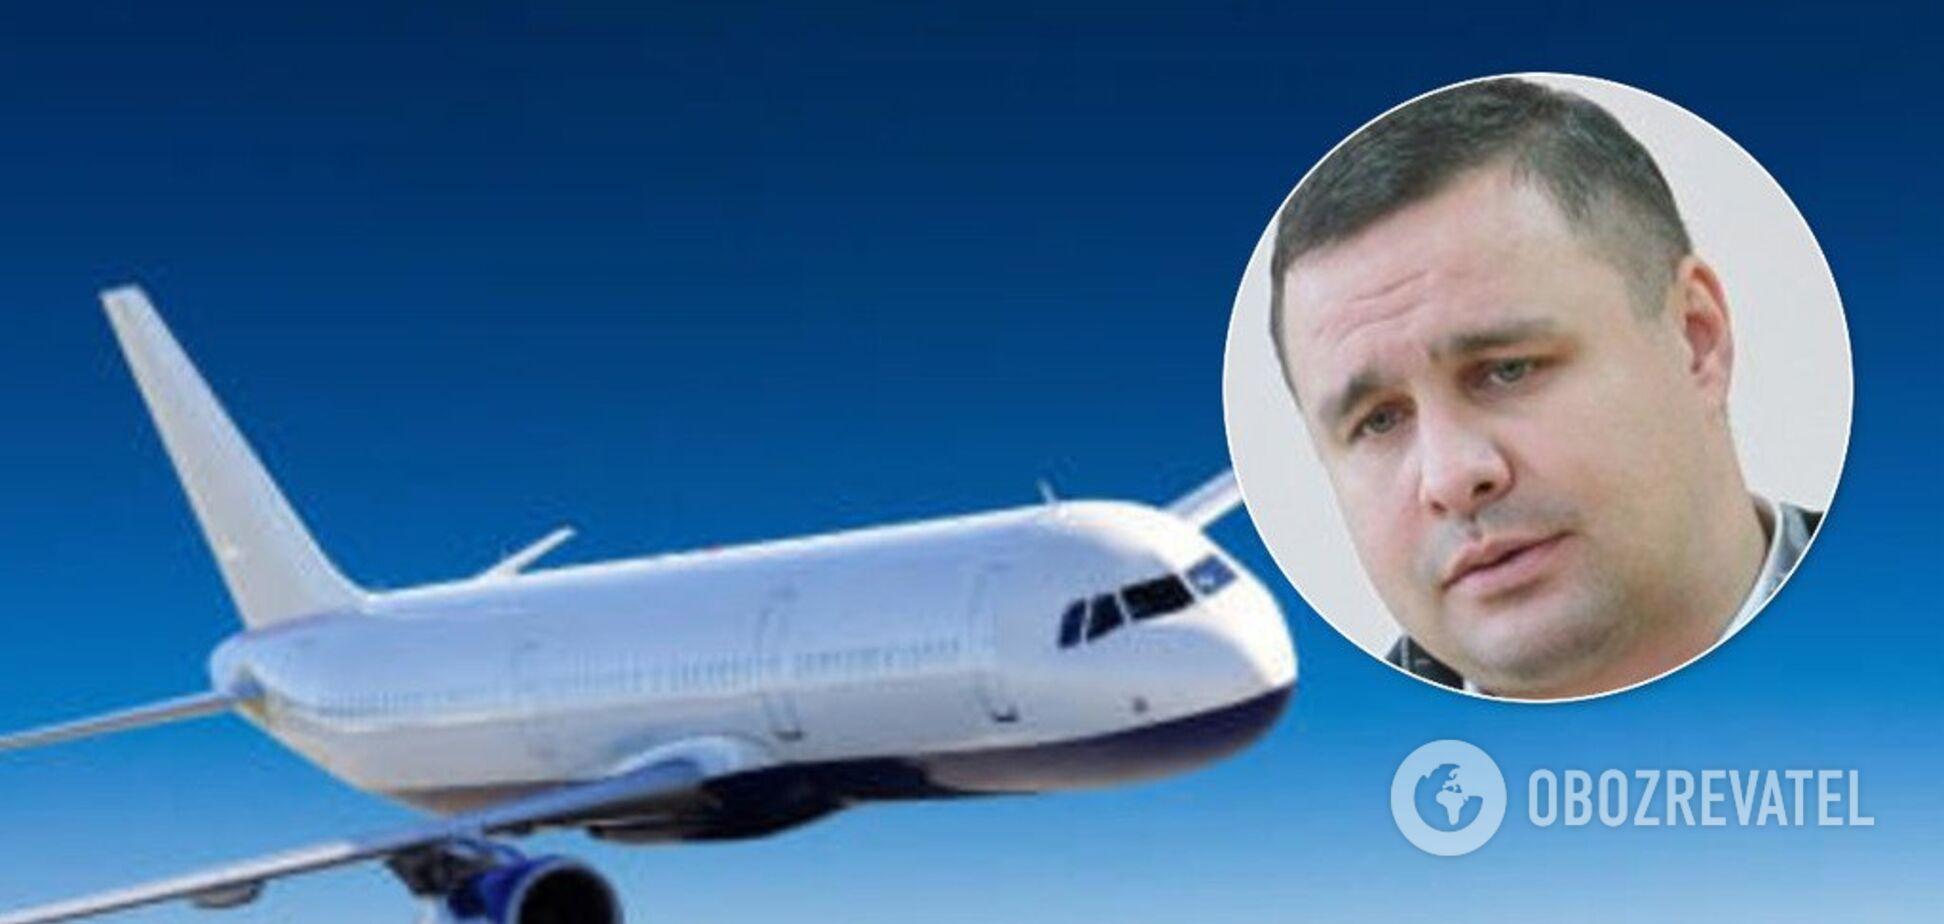 Скандального екснардепа України зняли з рейсу: на нього наділи електронний браслет